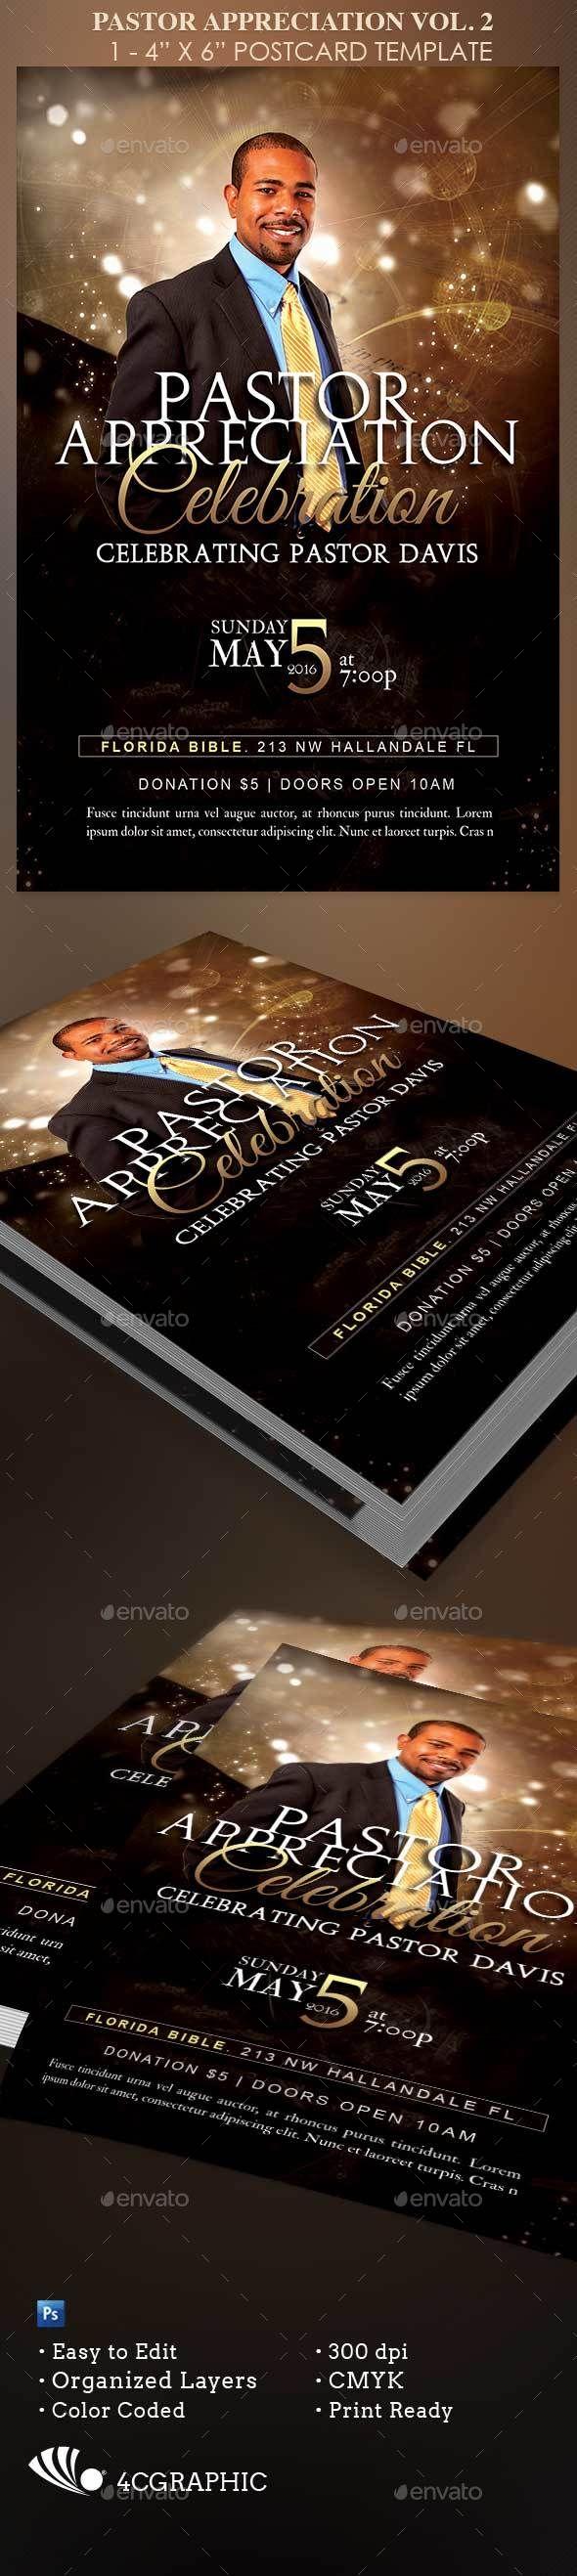 Starlight Pastor Anniversary Vol. 2  — PSD Template #postcard #church • Download ➝ https://graphicriver.net/item/starlight-pastor-anniversary-vol-2-/17697492?ref=pxcr